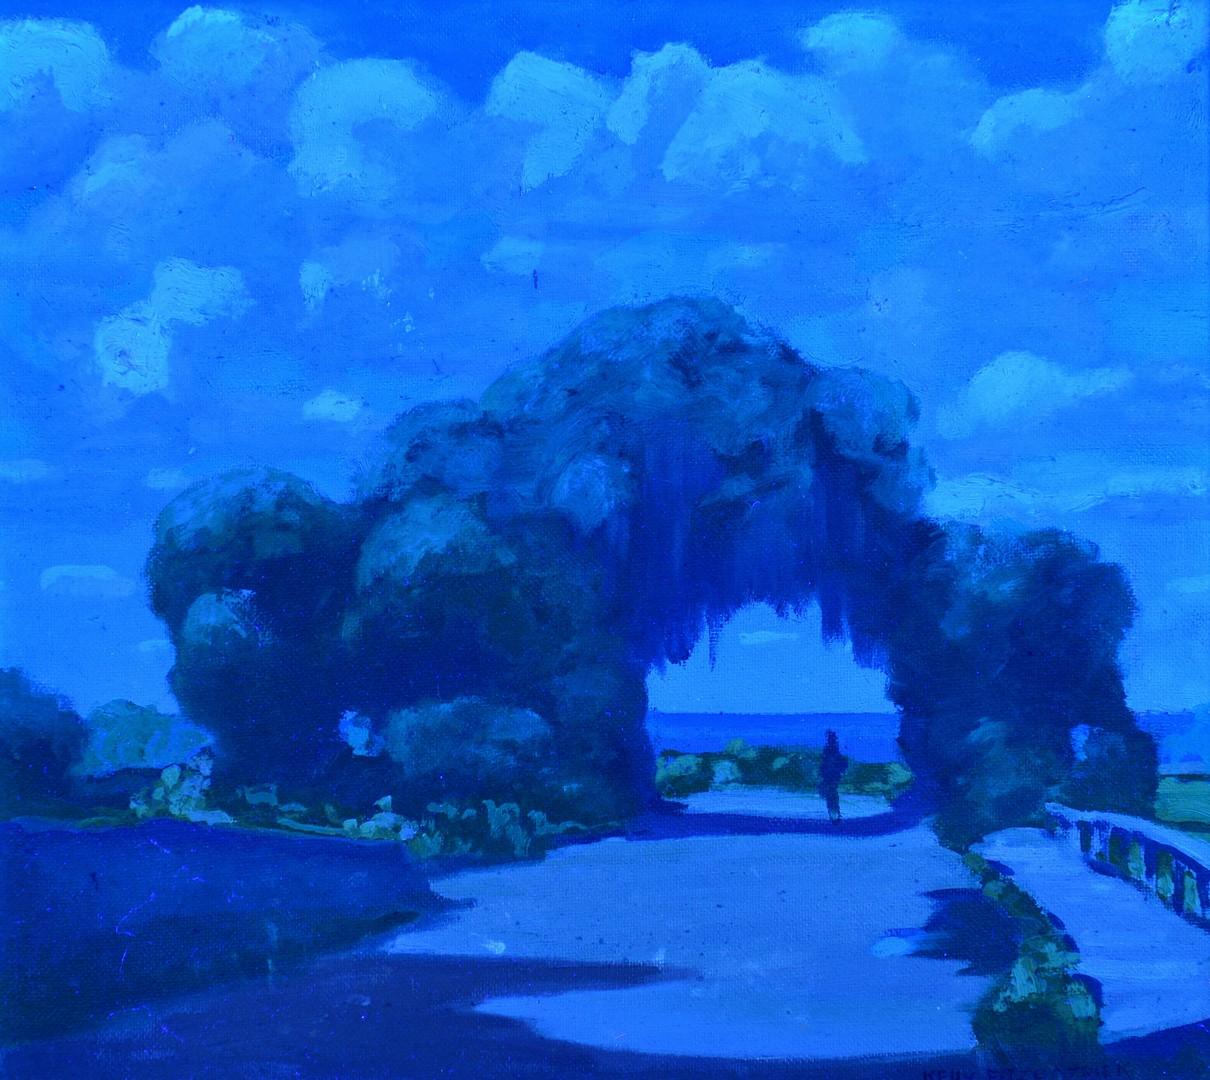 Lot 197: John Kelly Fitzpatrick Oil on Canvas Landscape